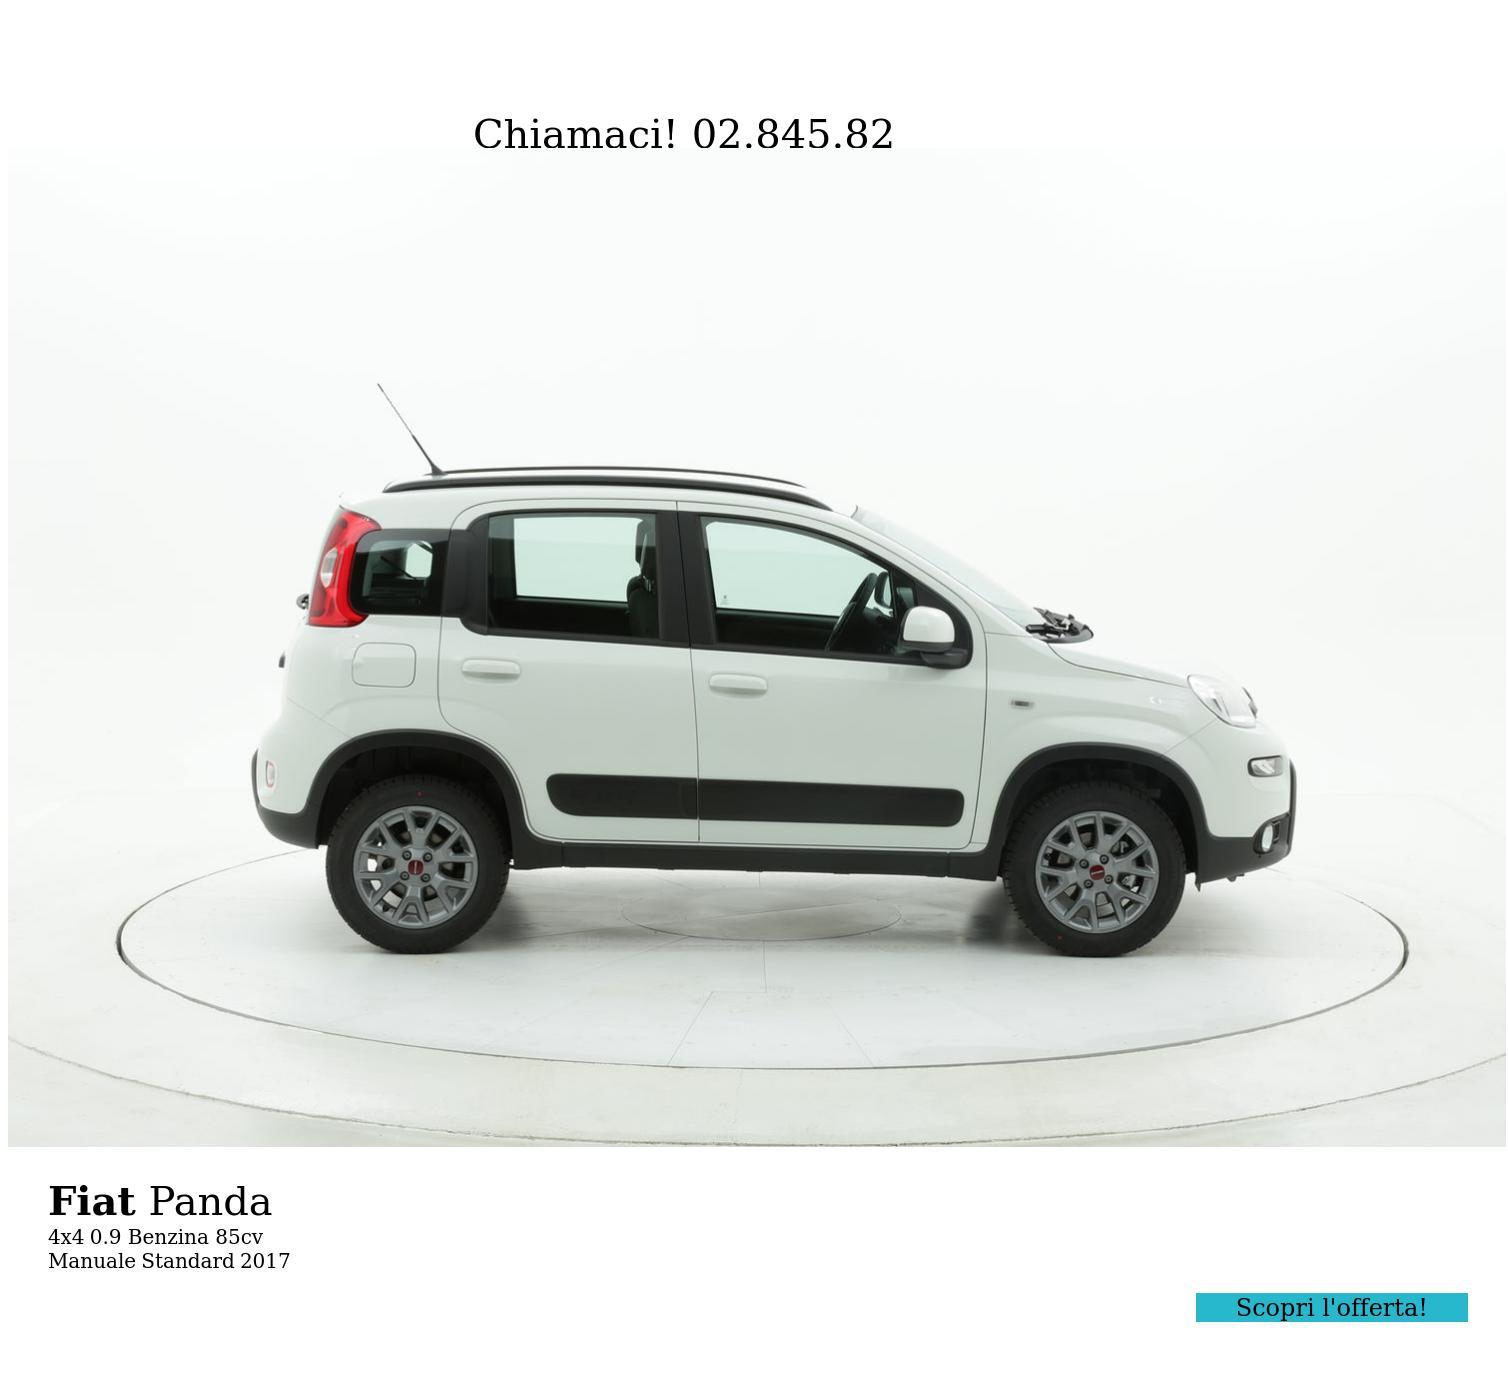 Fiat Panda 4x4 km 0 benzina bianca | brumbrum